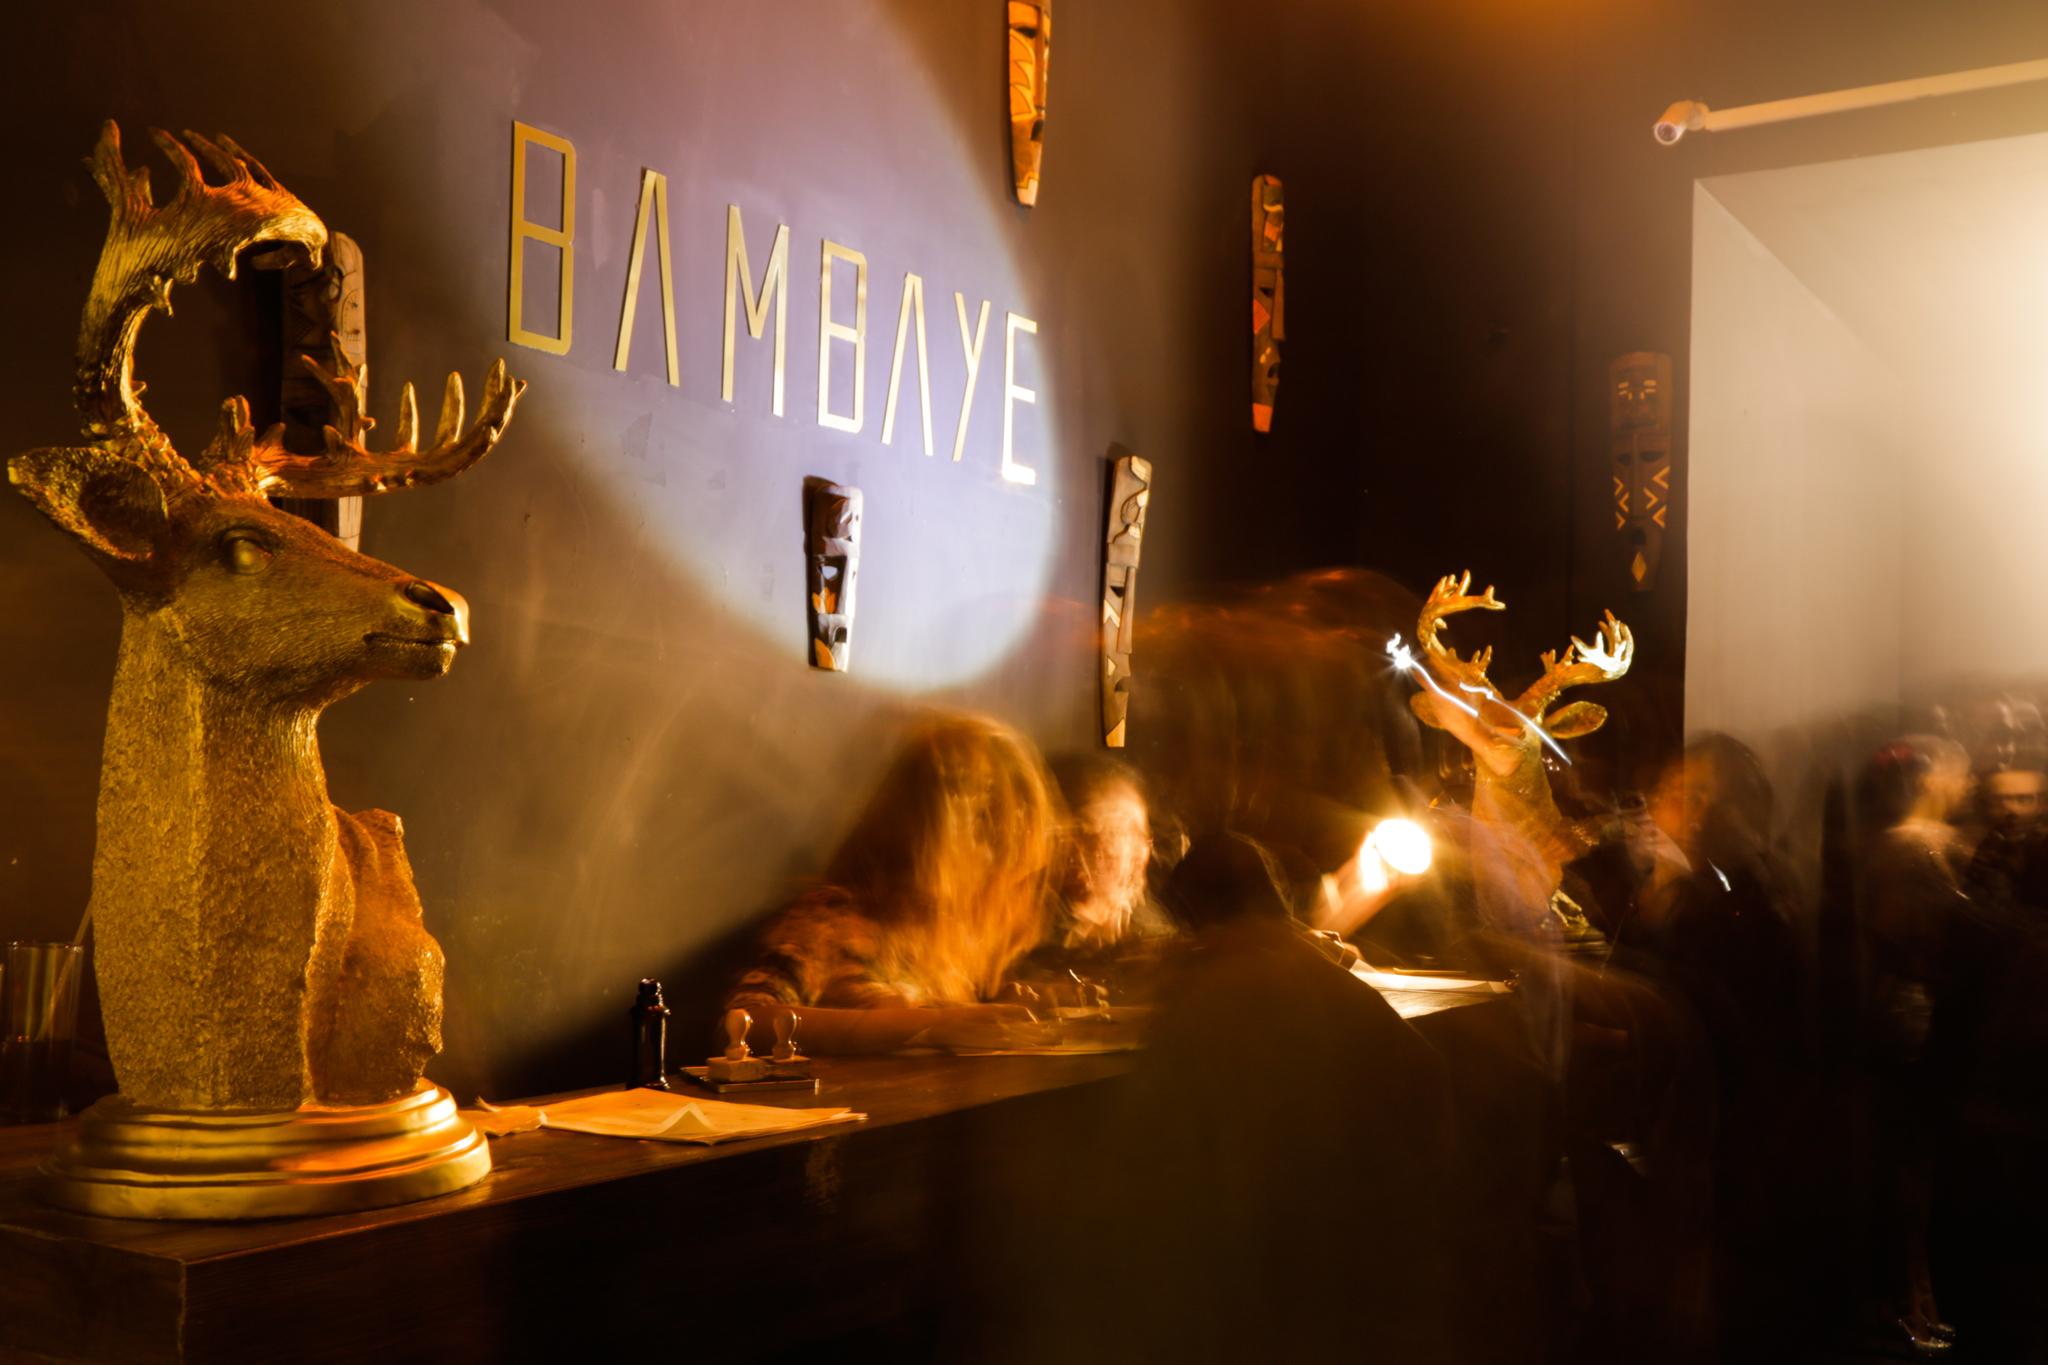 Bambaye